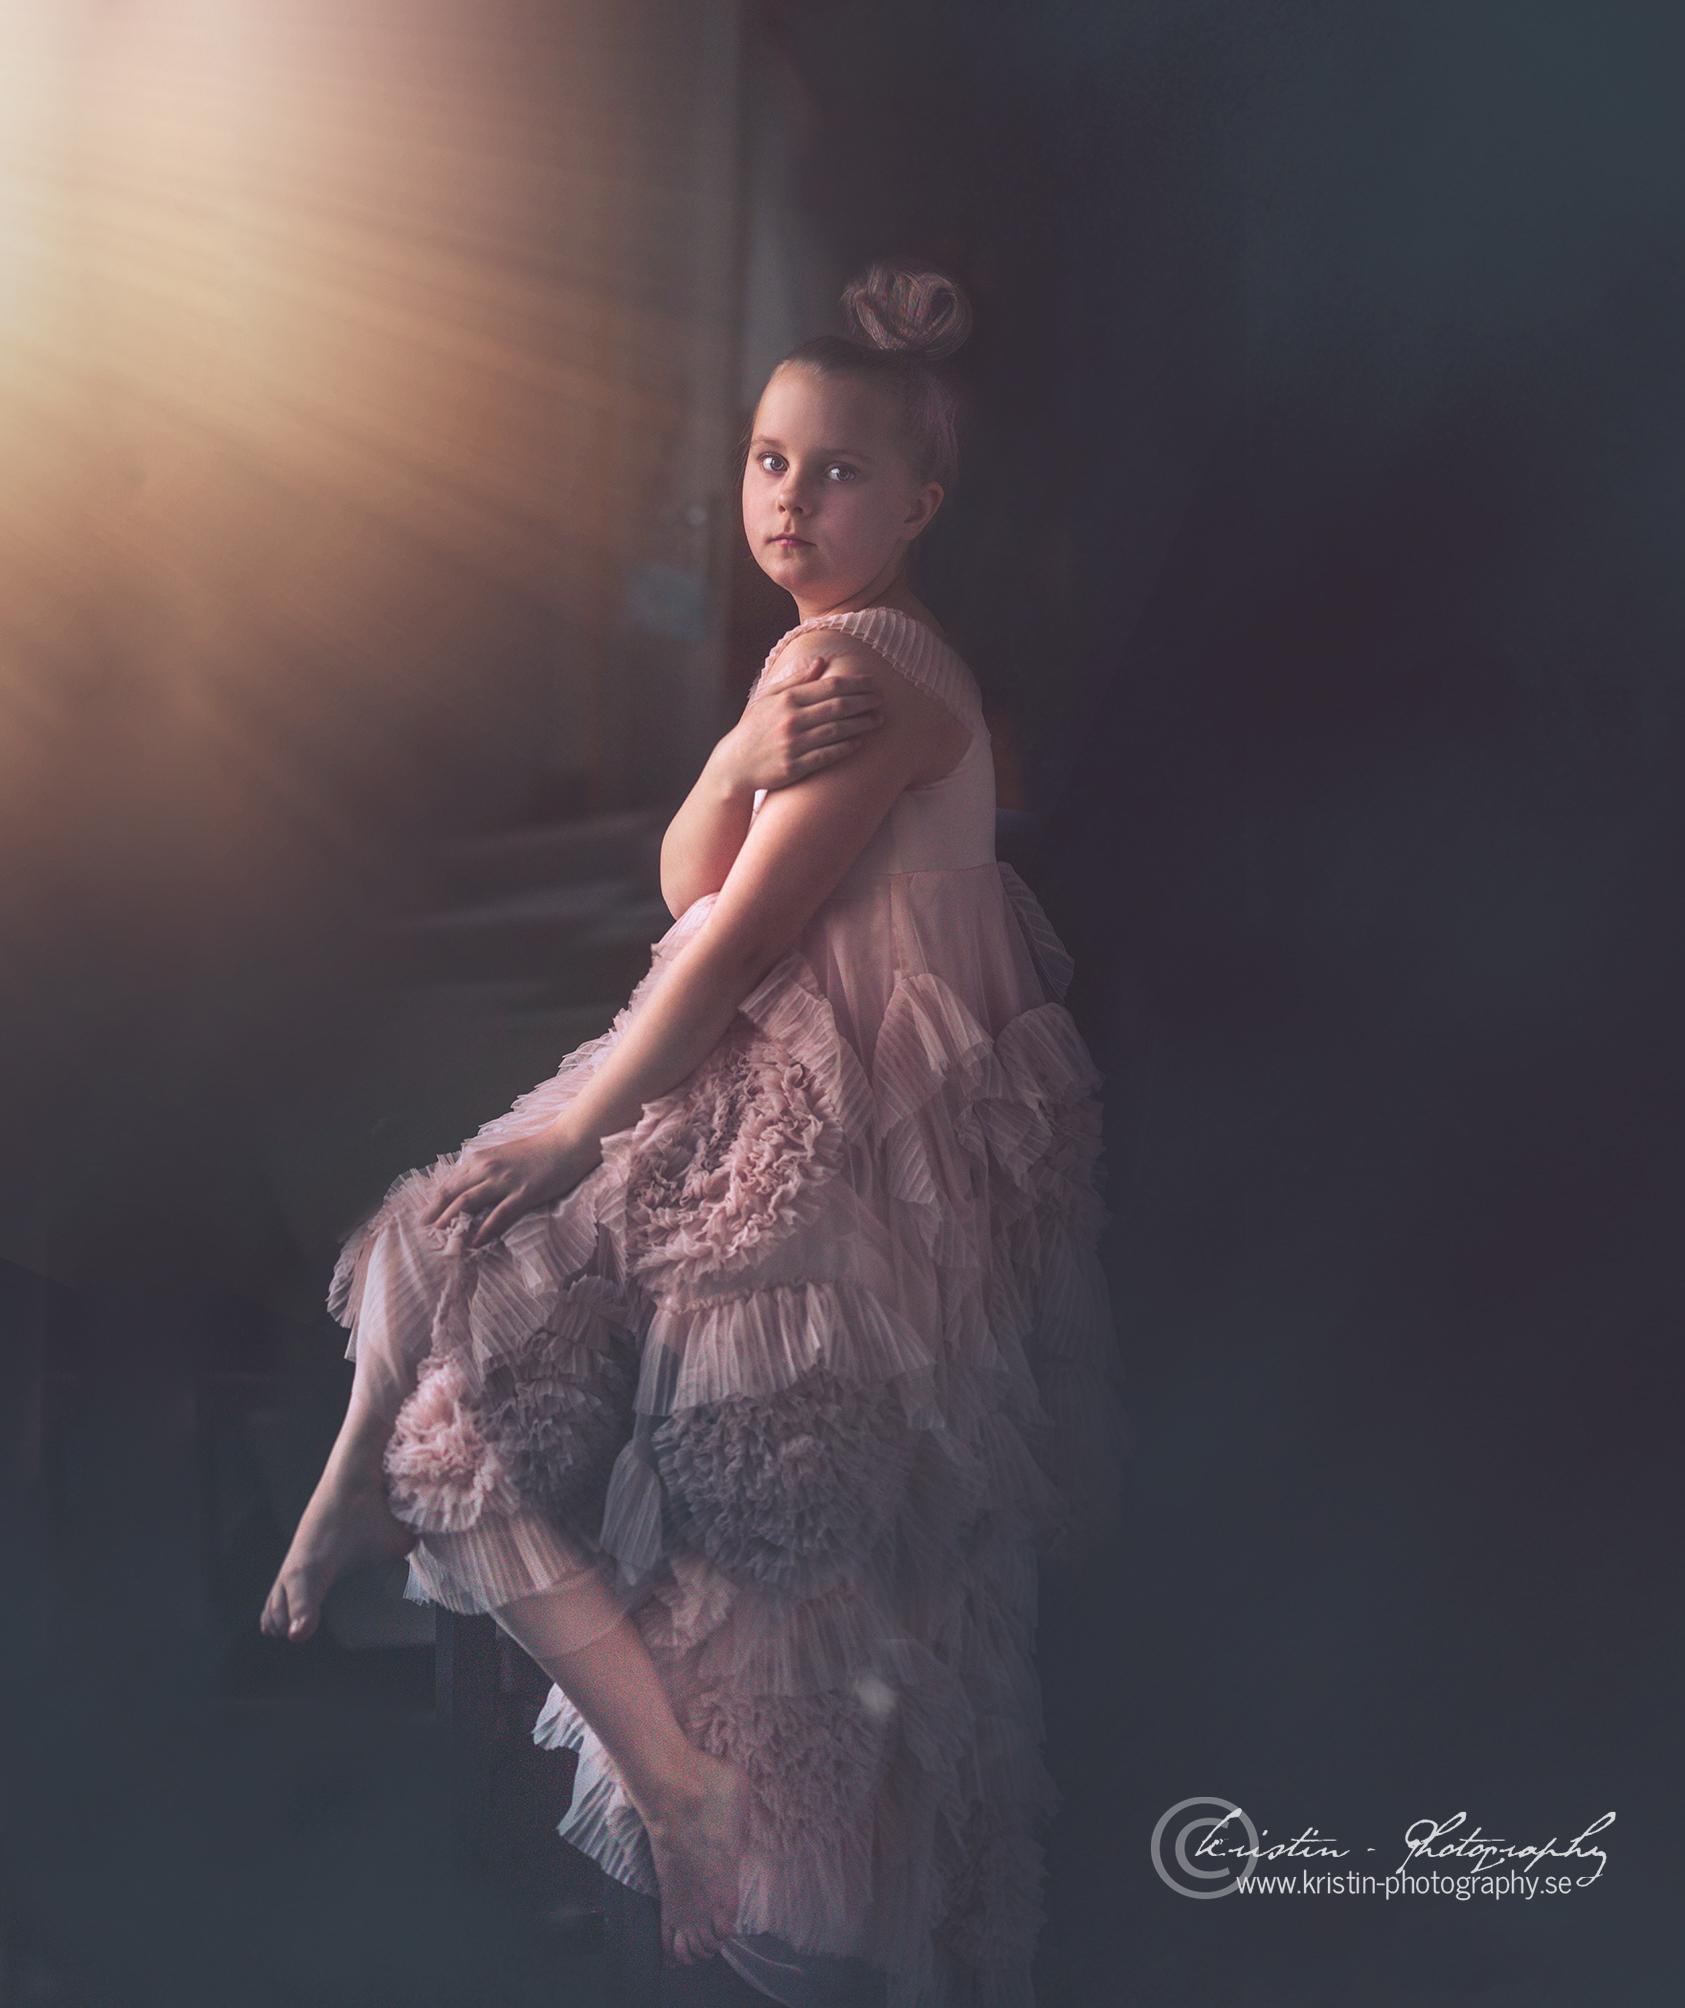 Barnfotograf Kristin - Photography-1cop.jpg